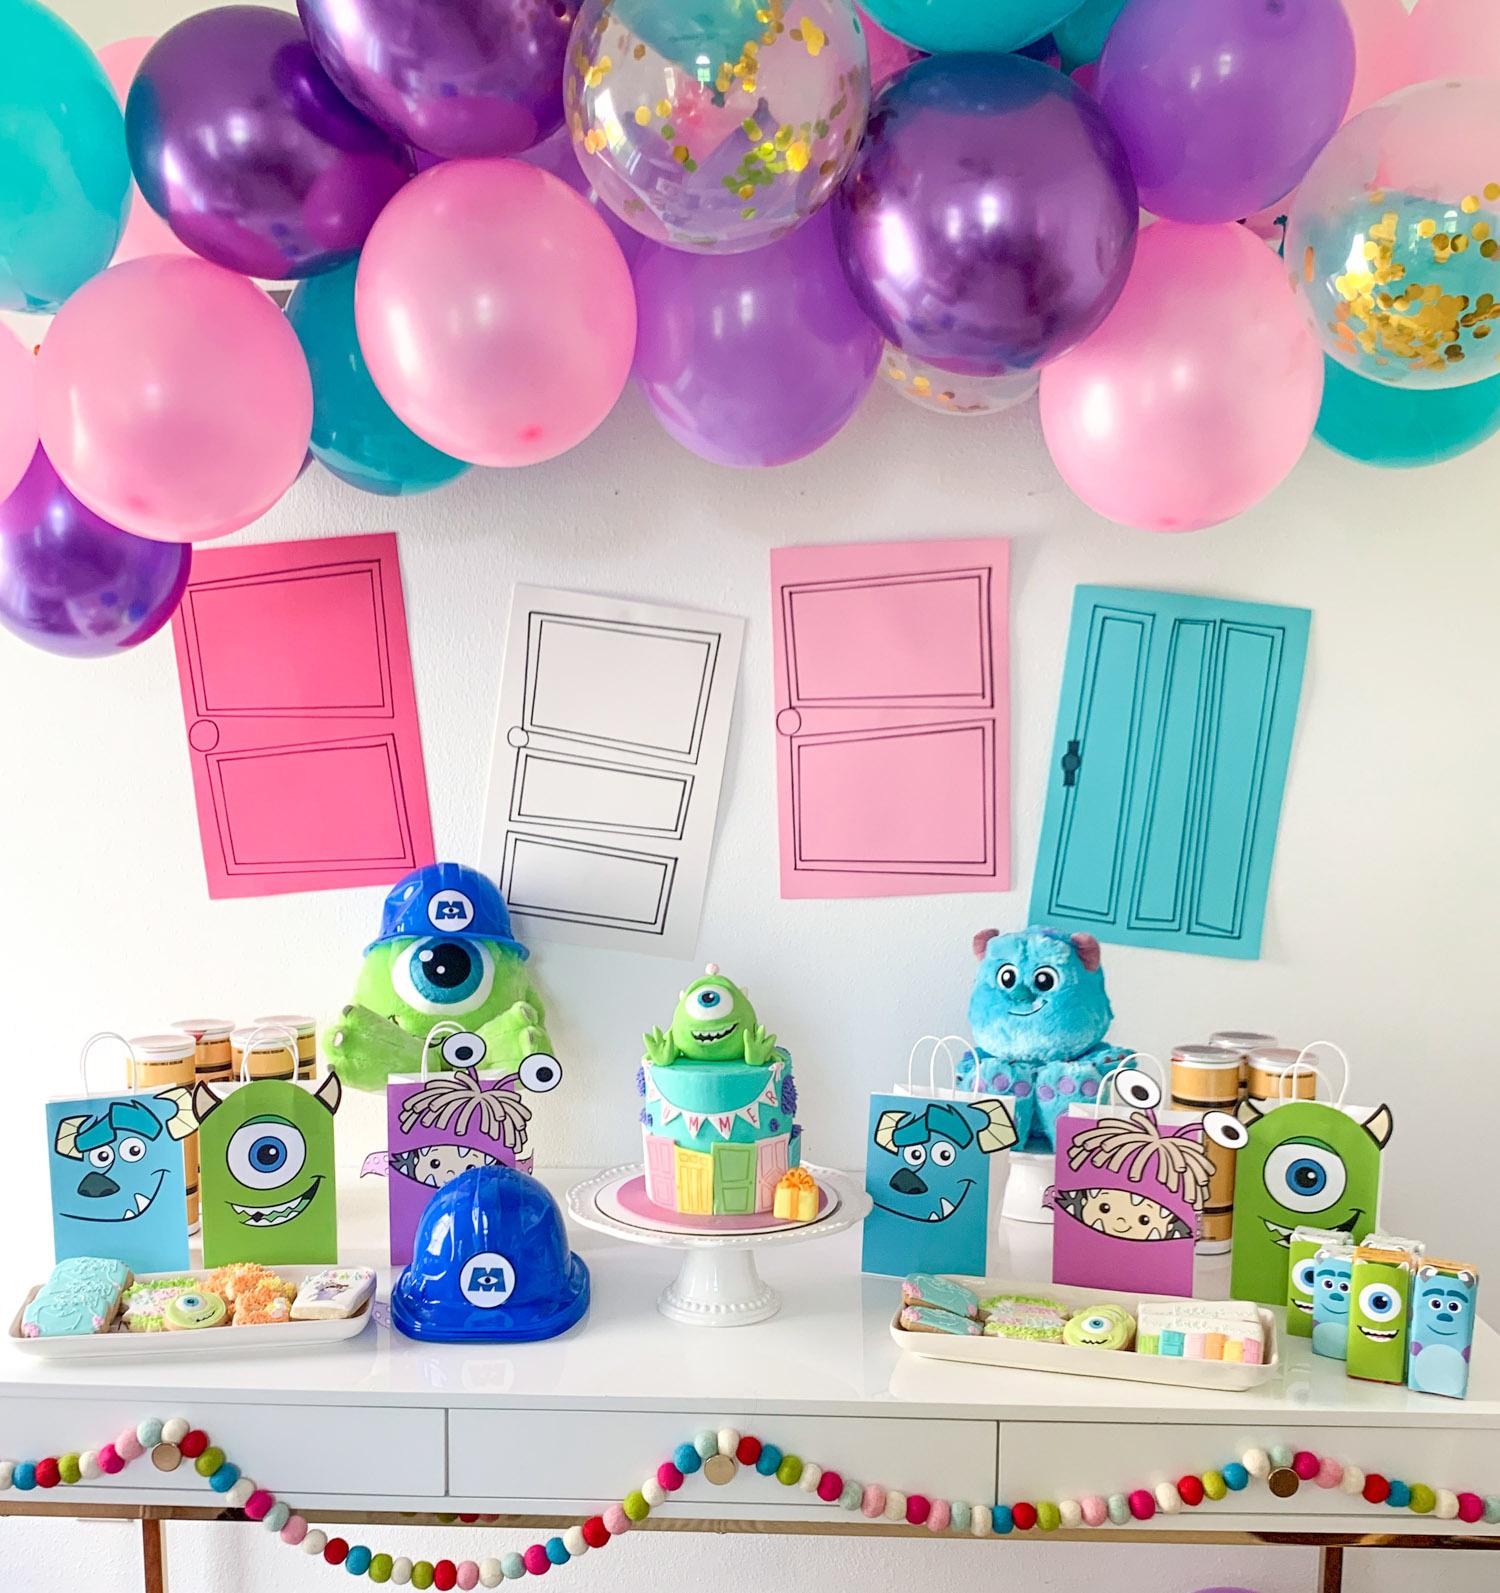 Monsters Inc Birthday Party Ideas Ashley Brooke Nicholas